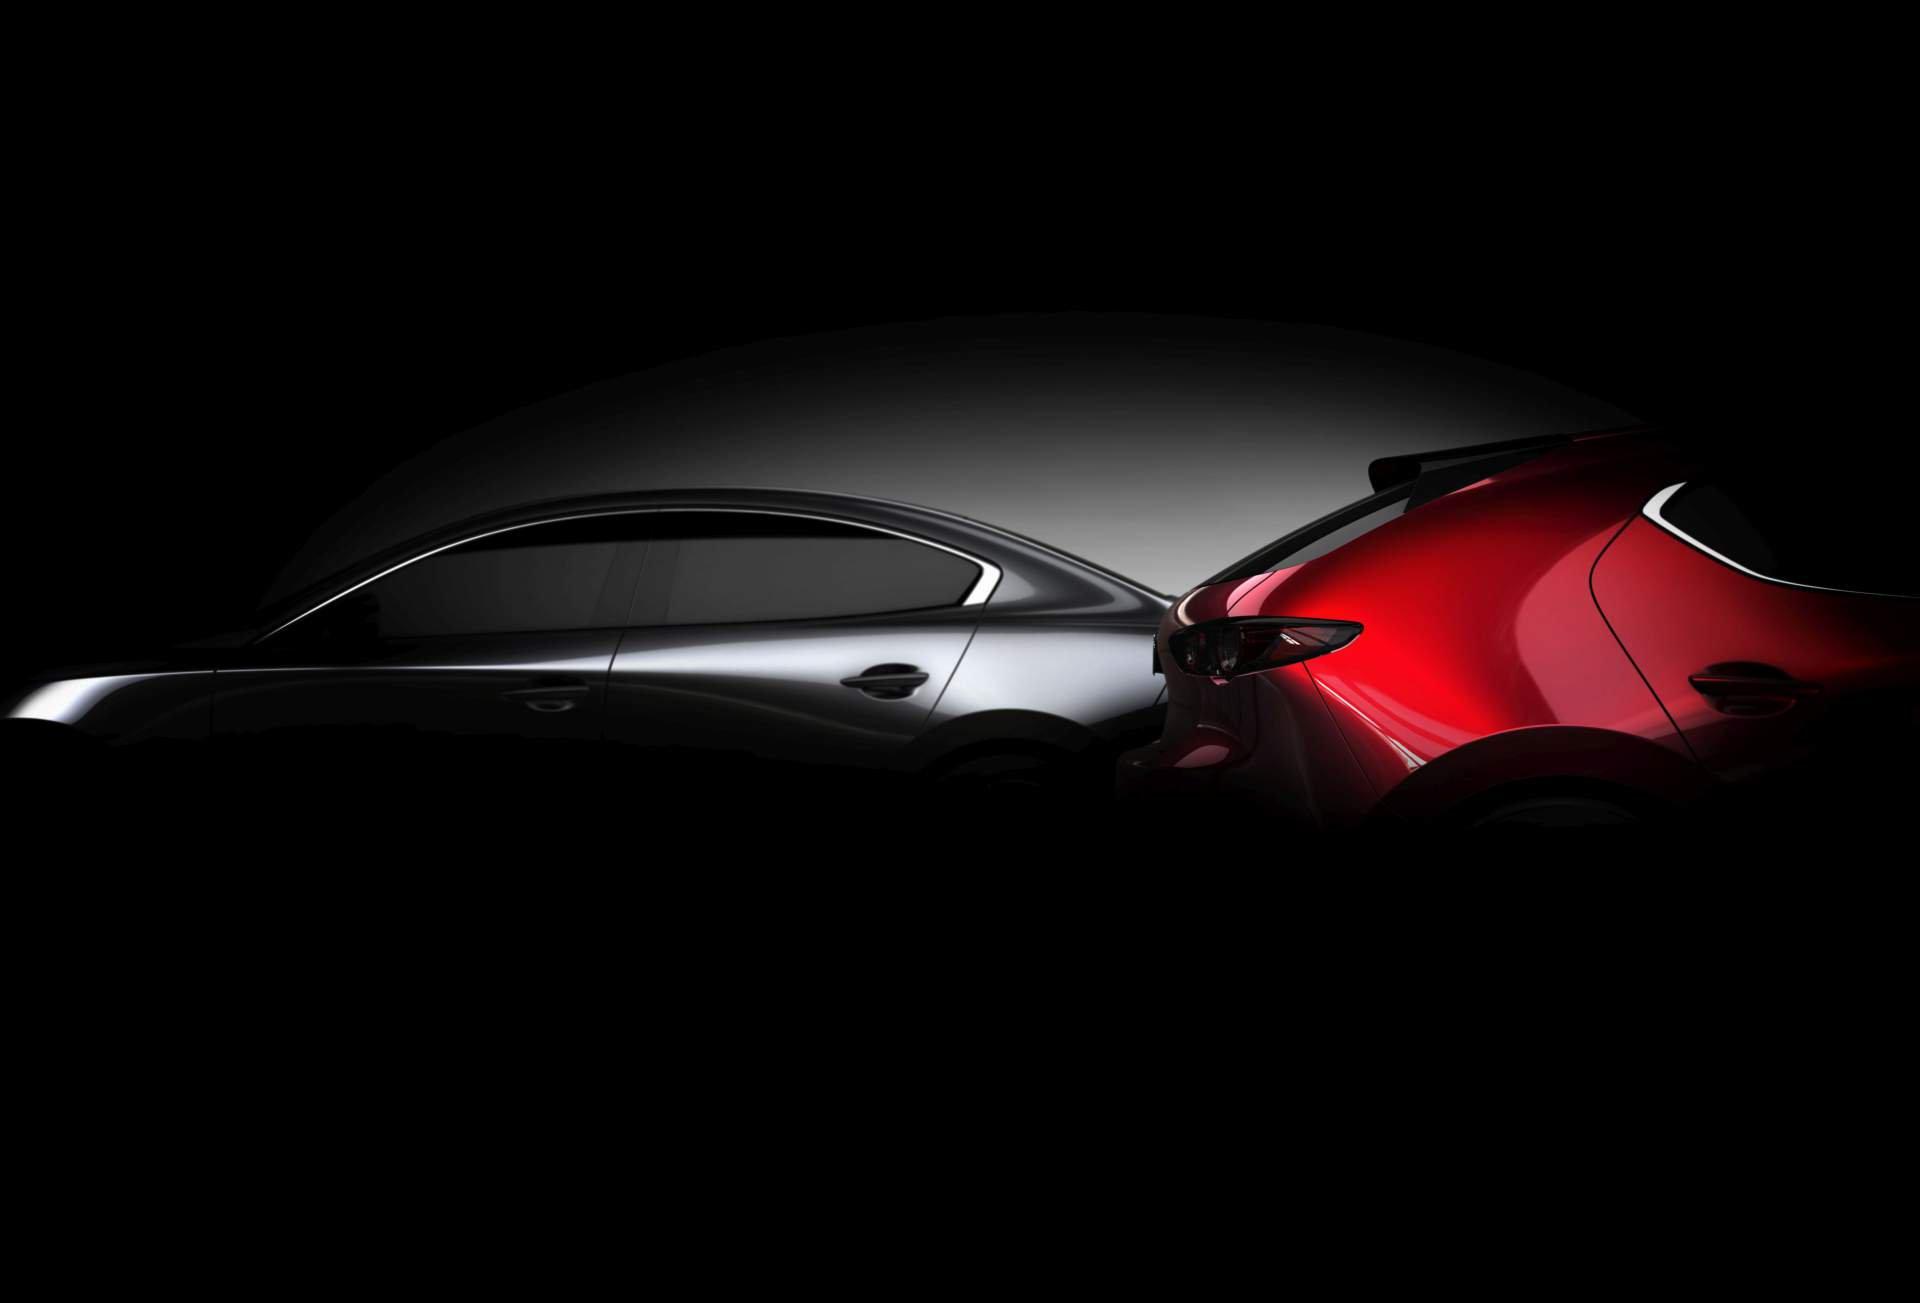 2019-mazda3-sedan-and-hatchback-1.jpg